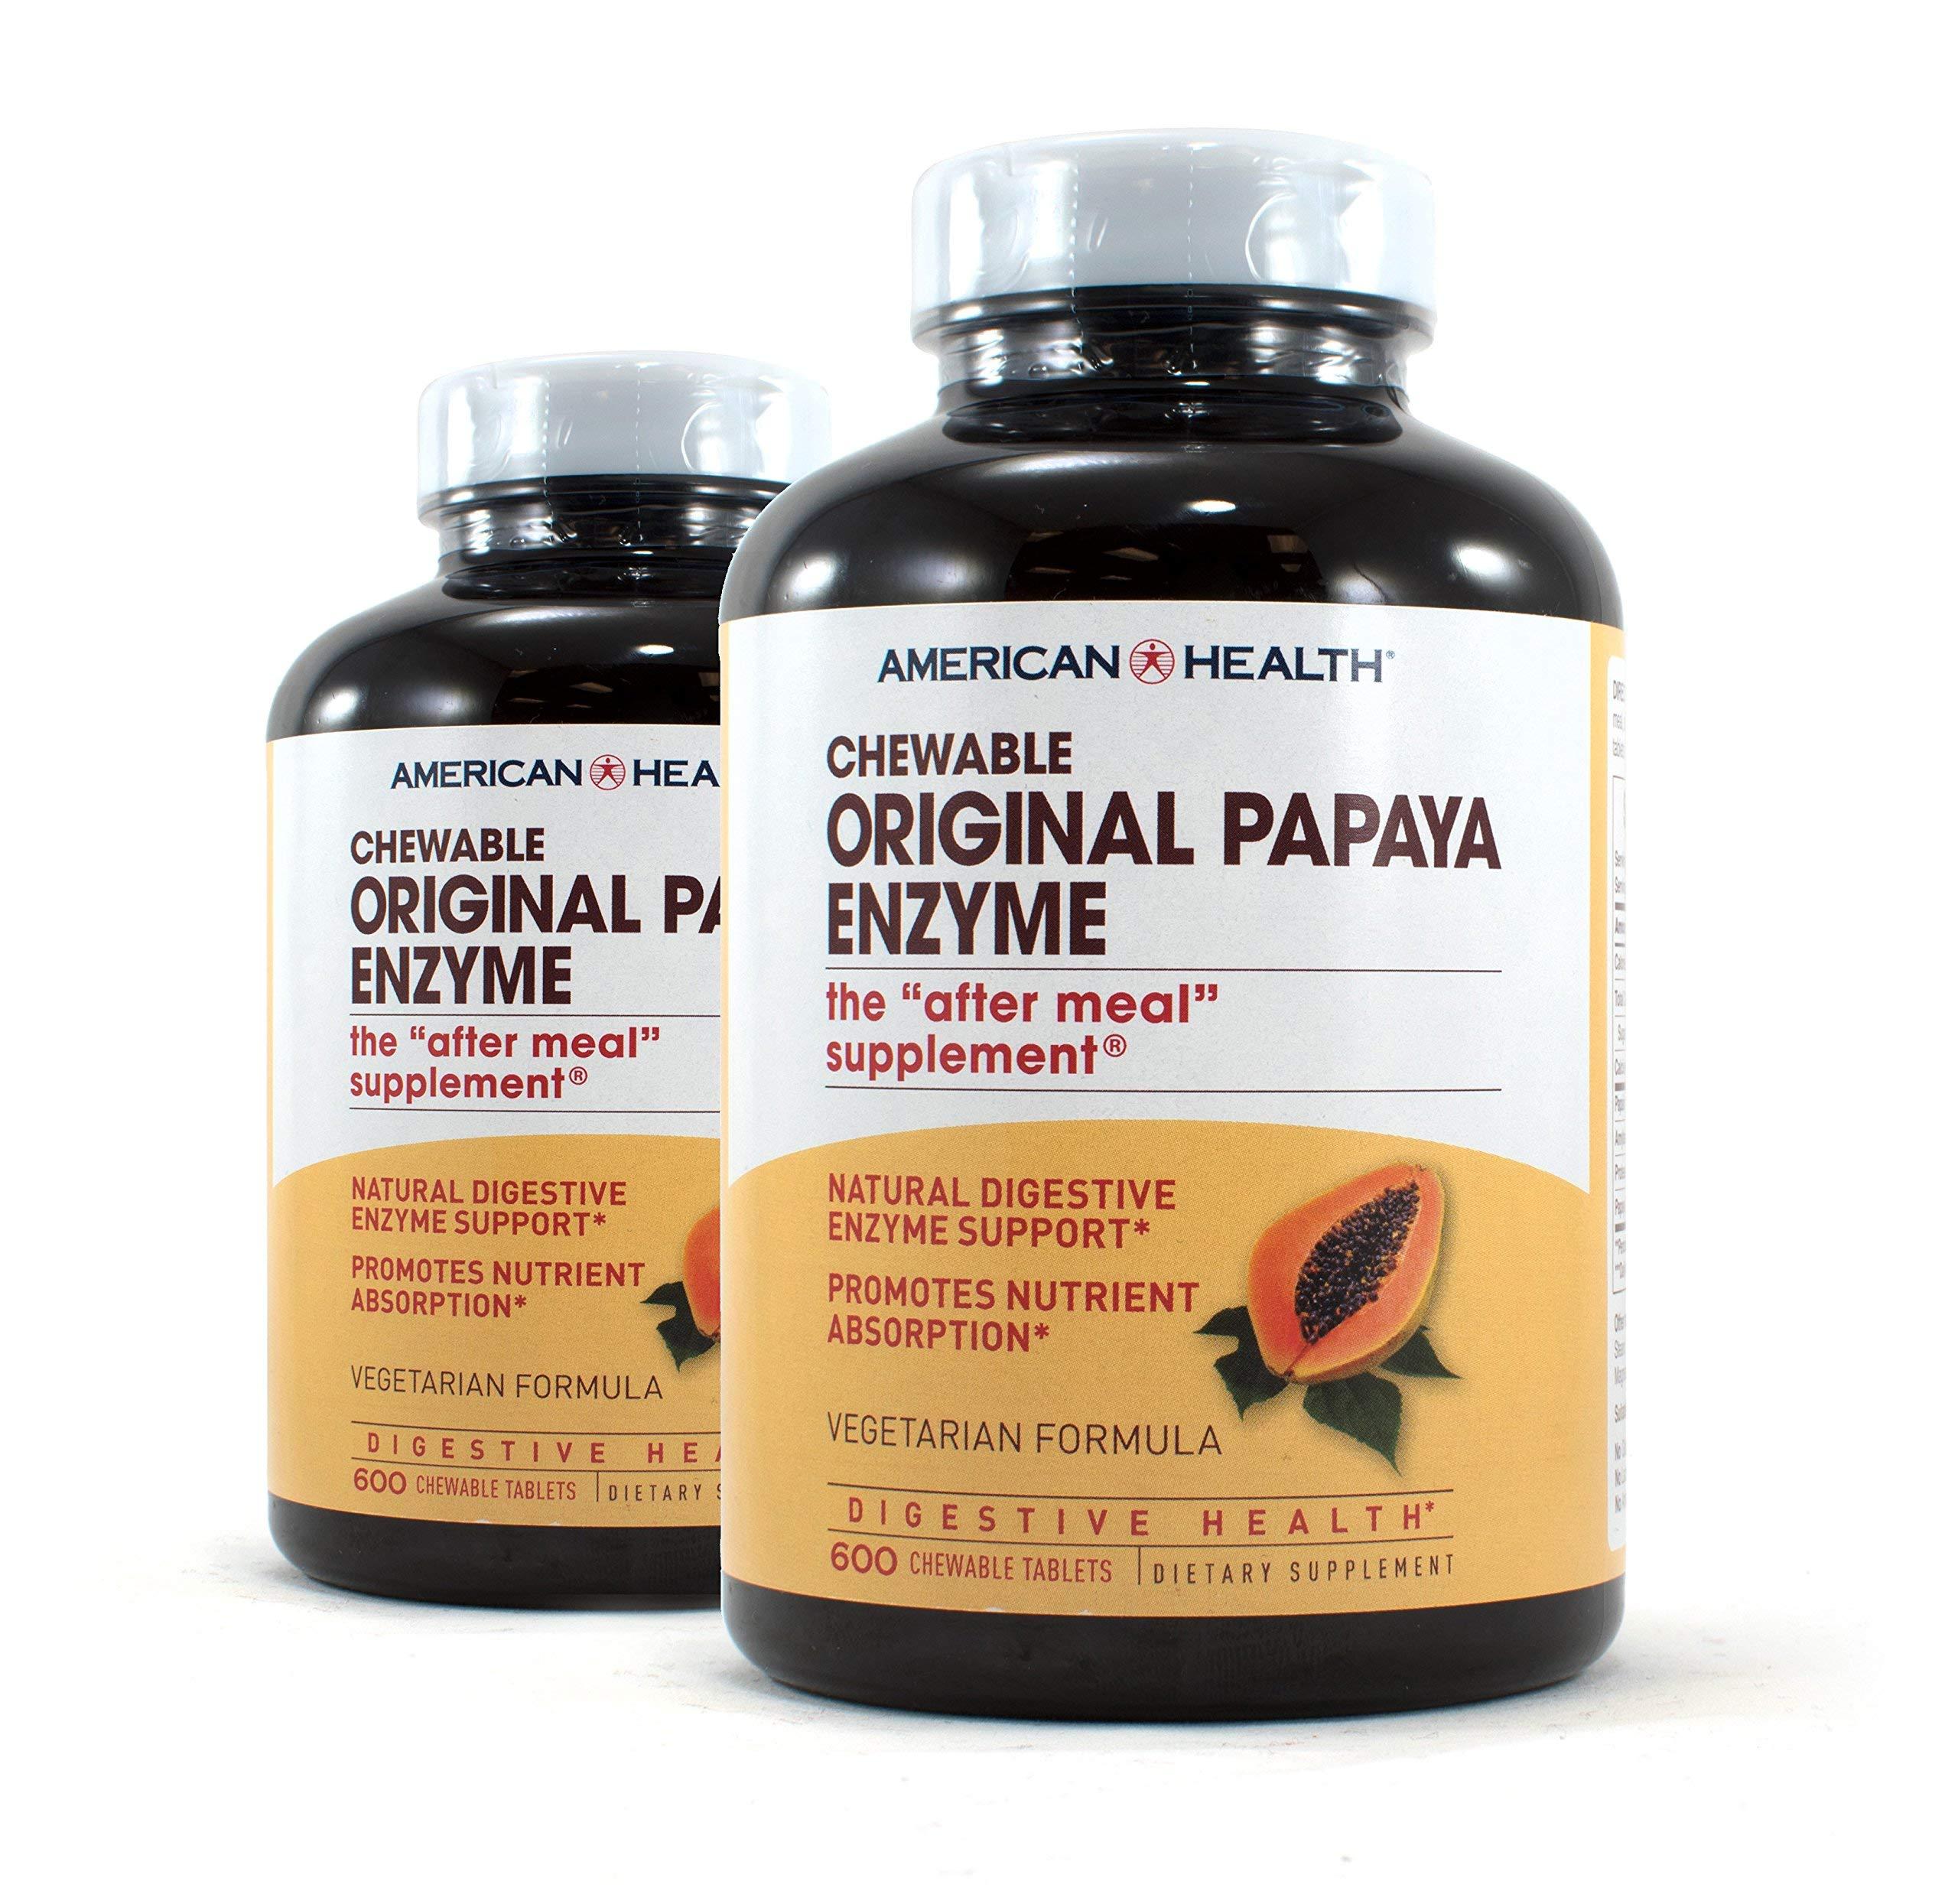 American Health Enzymes Chewable Original Papaya Enzyme 600 tablets - Pack of 2